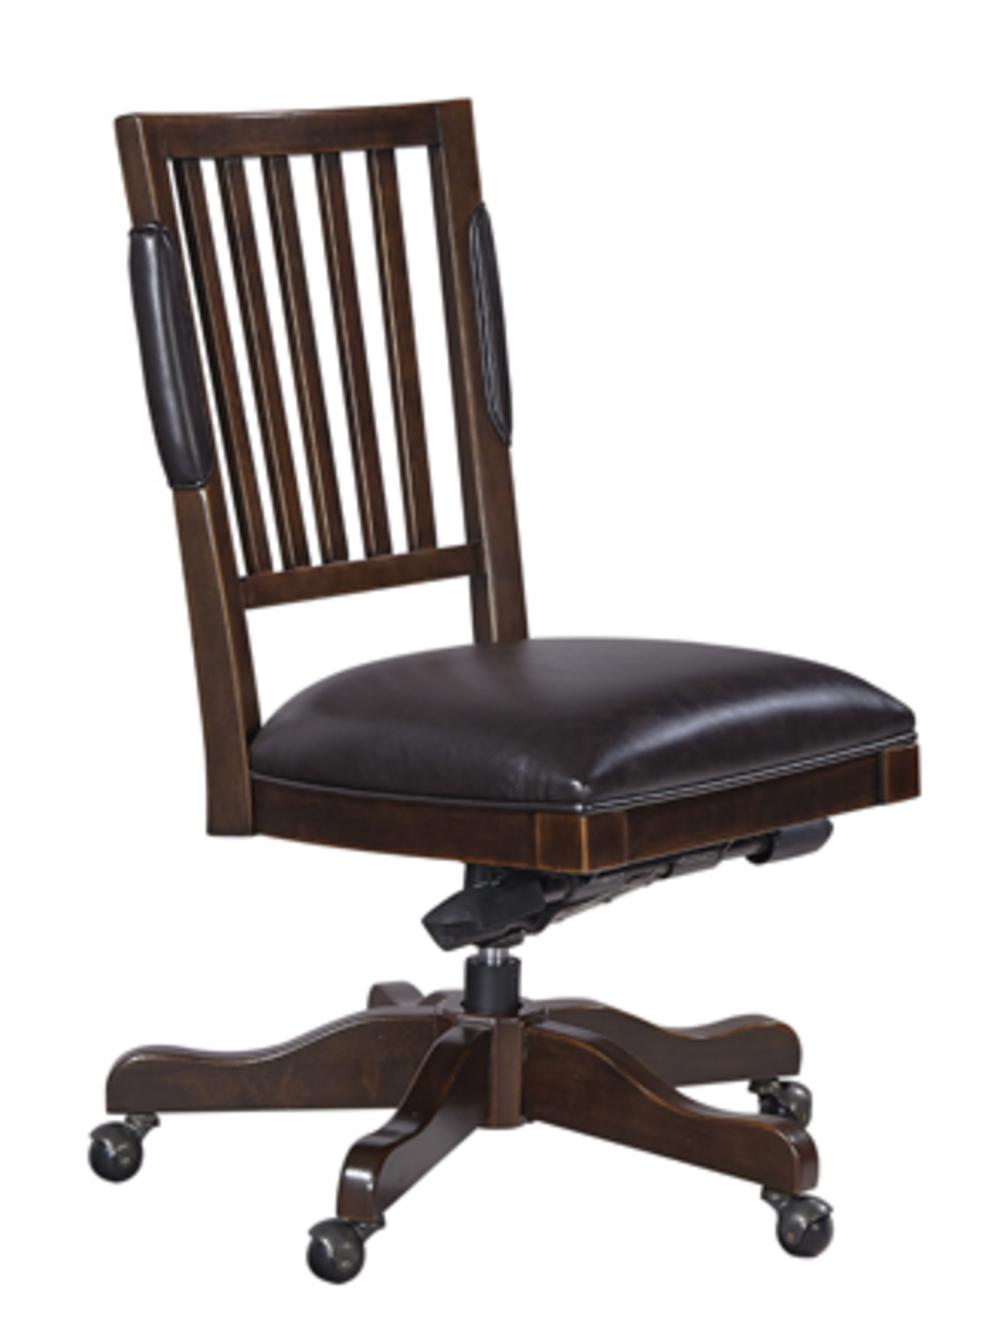 Aspenhome - Weston Office Chair